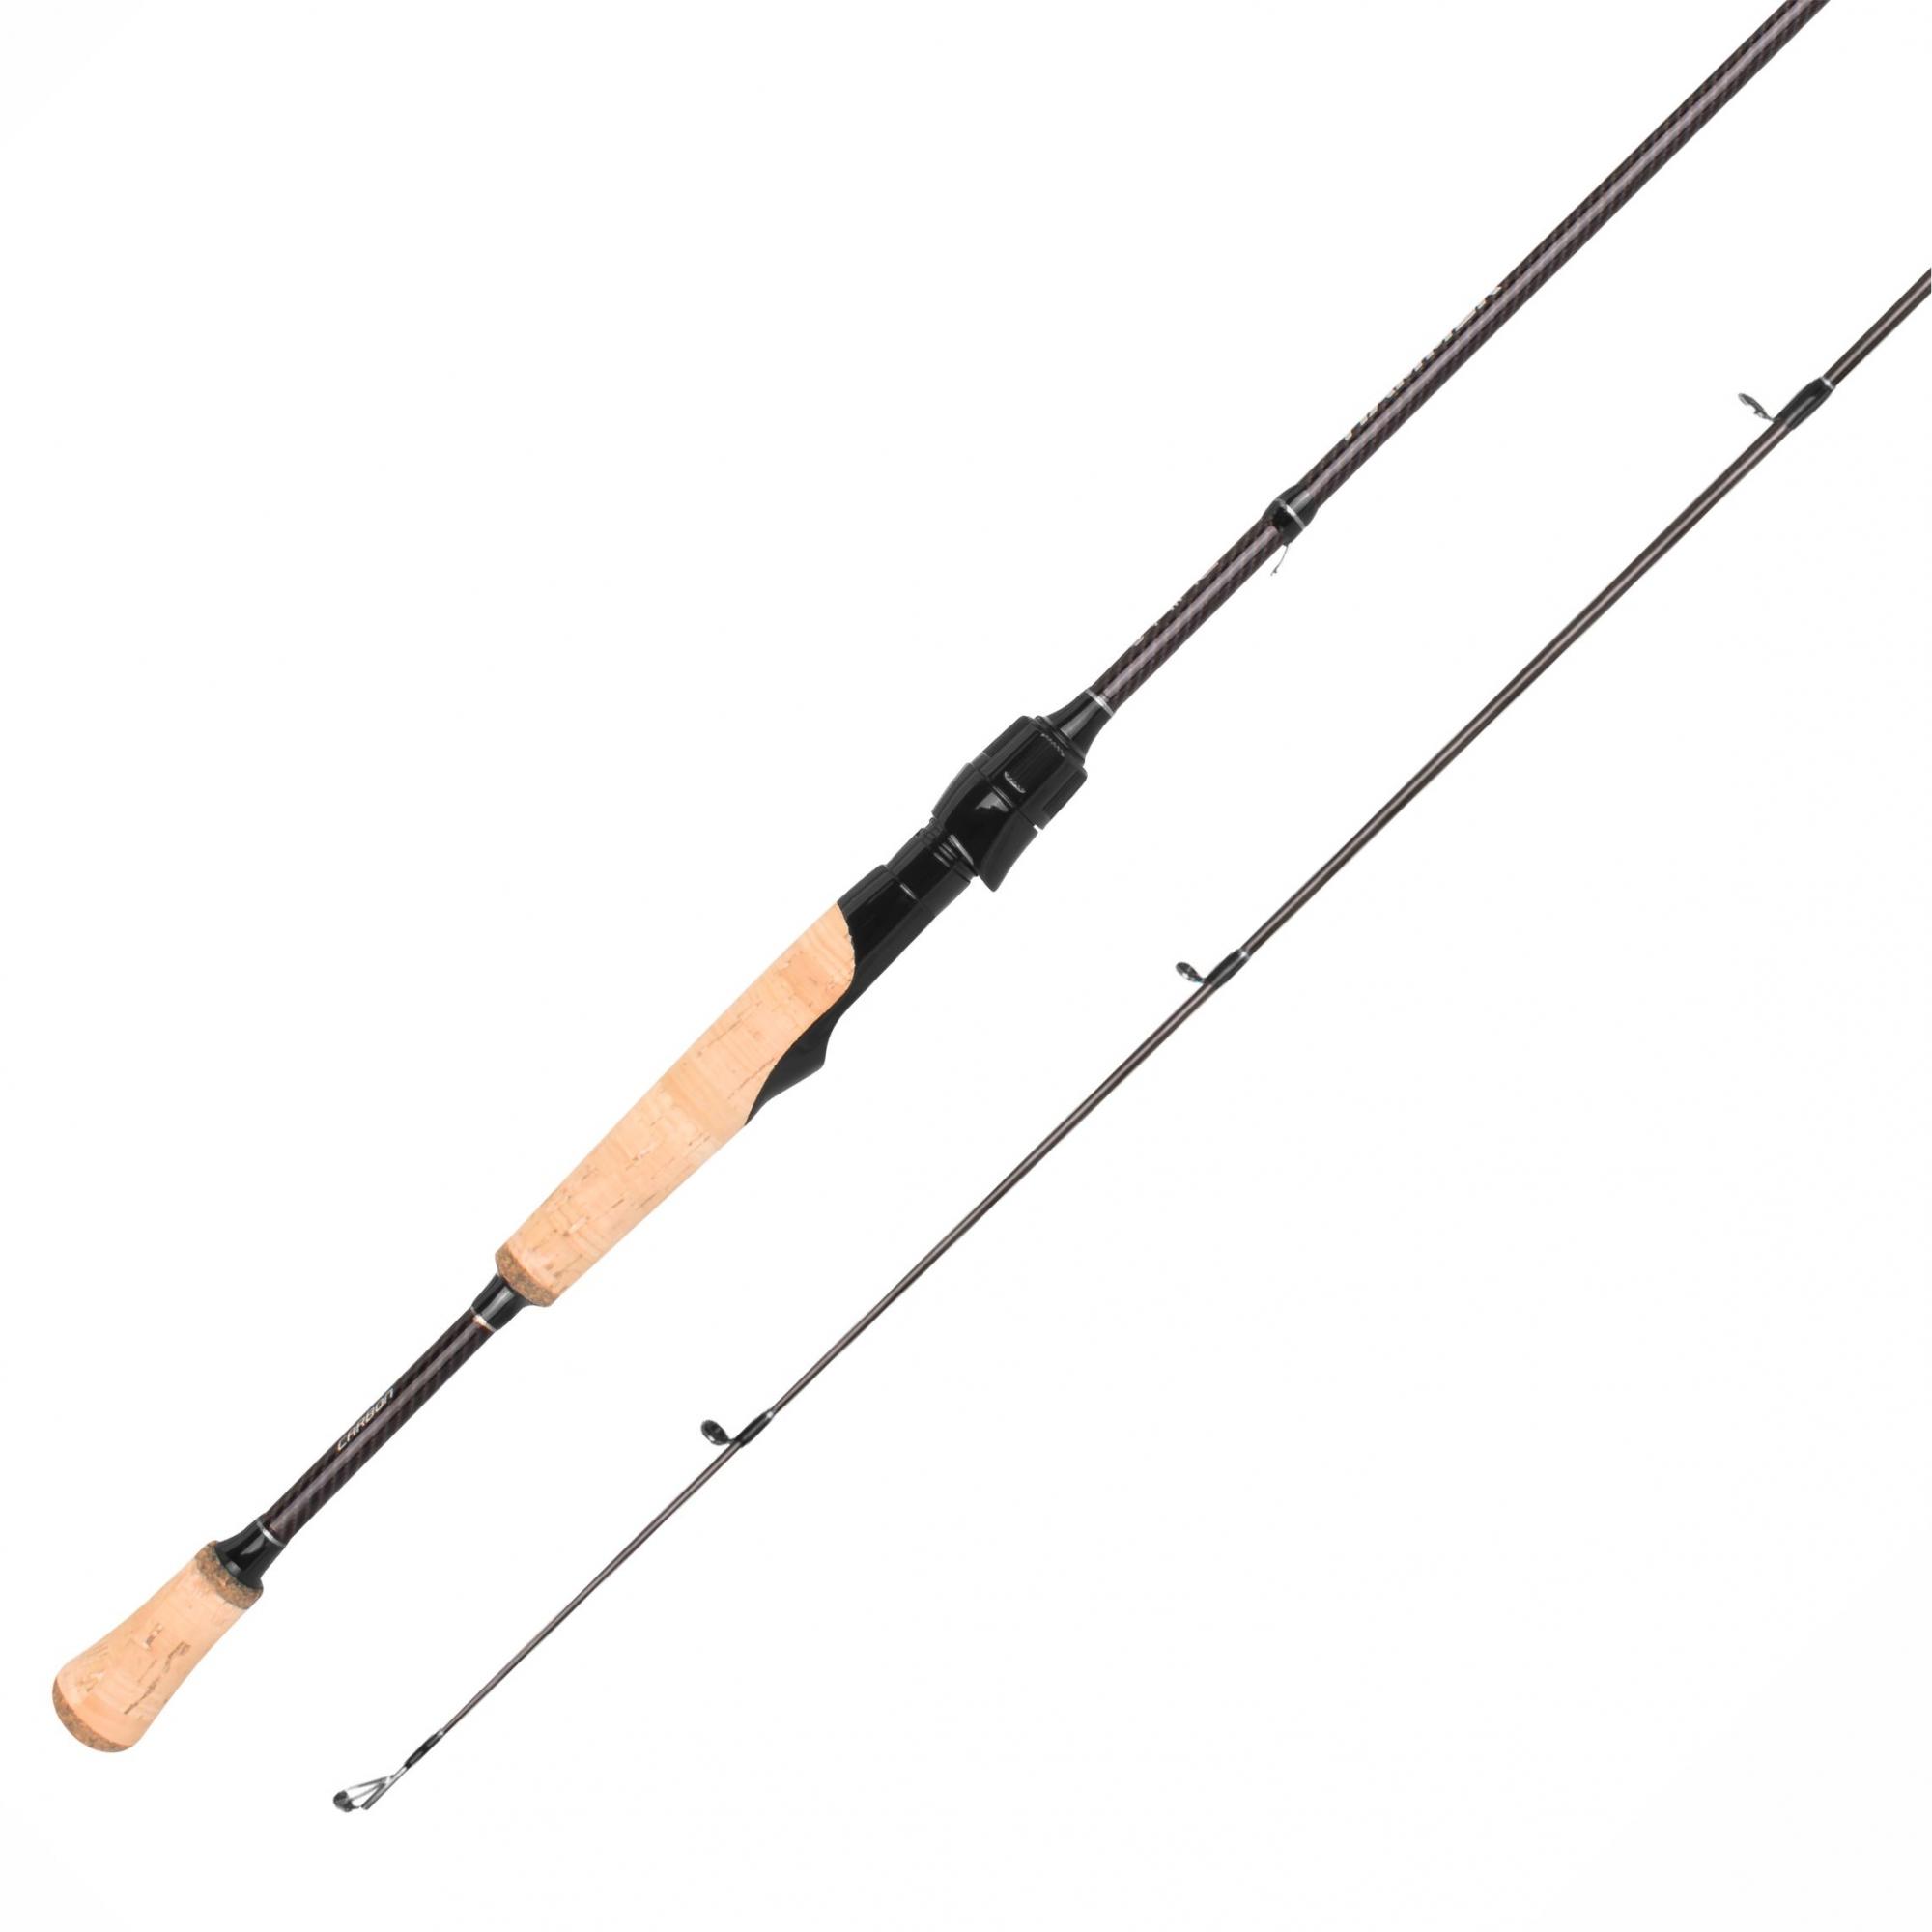 Vara Saint Hammer 581 1,73m 8-20LB p/ Molinete  - Pesca Adventure